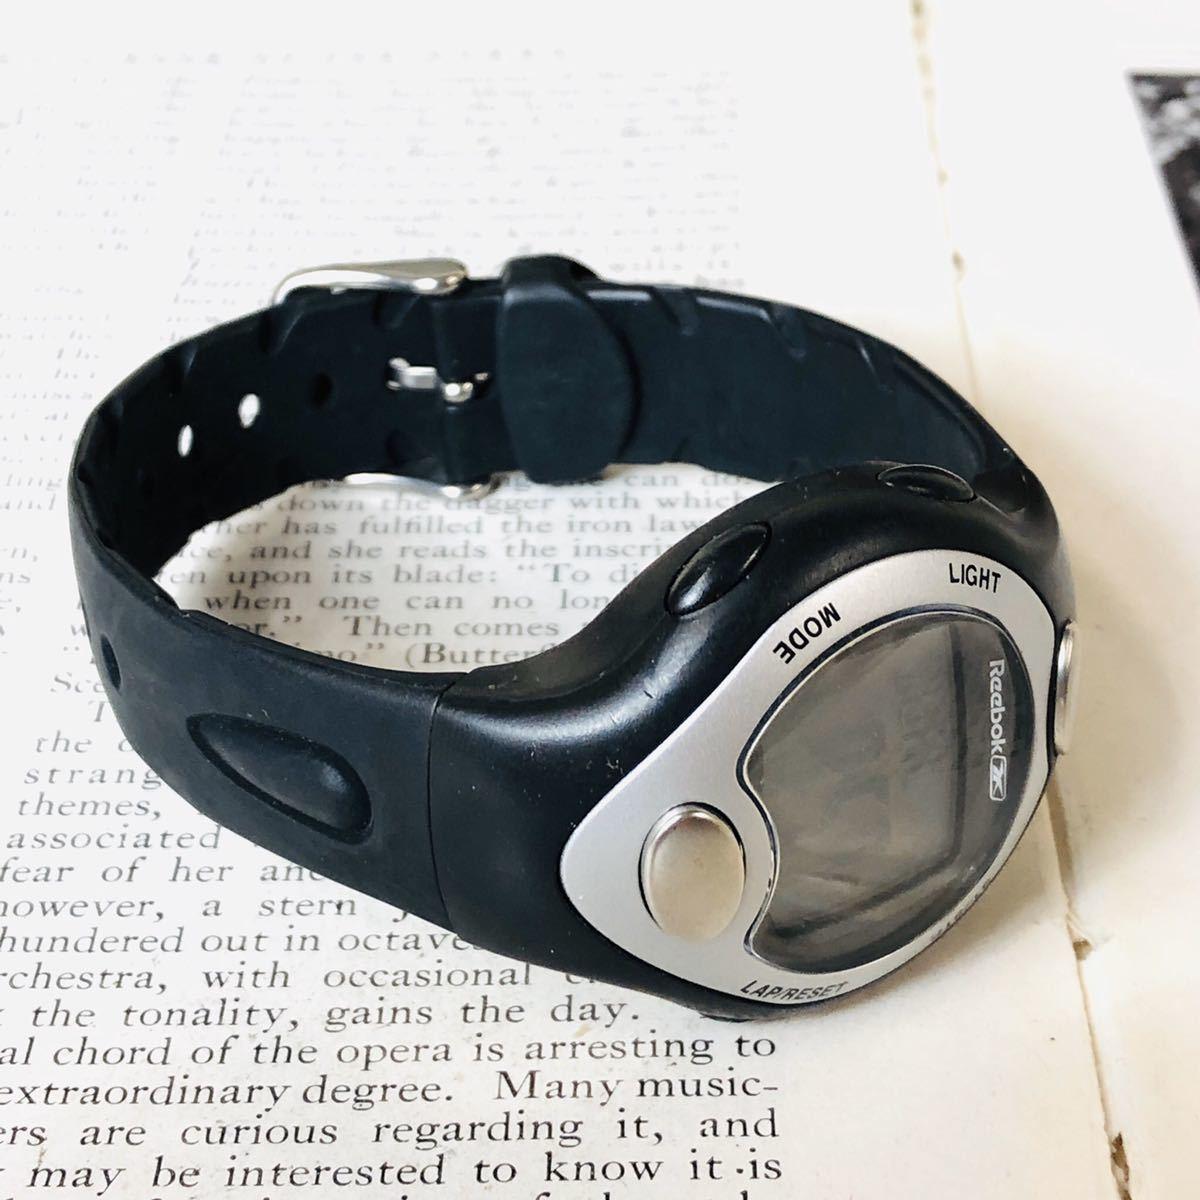 Reebok リーボック 腕時計 マットサテンシルバーカラー ブラック 心拍計 クロノ タイマー デジタル 稼動品 W730_画像5